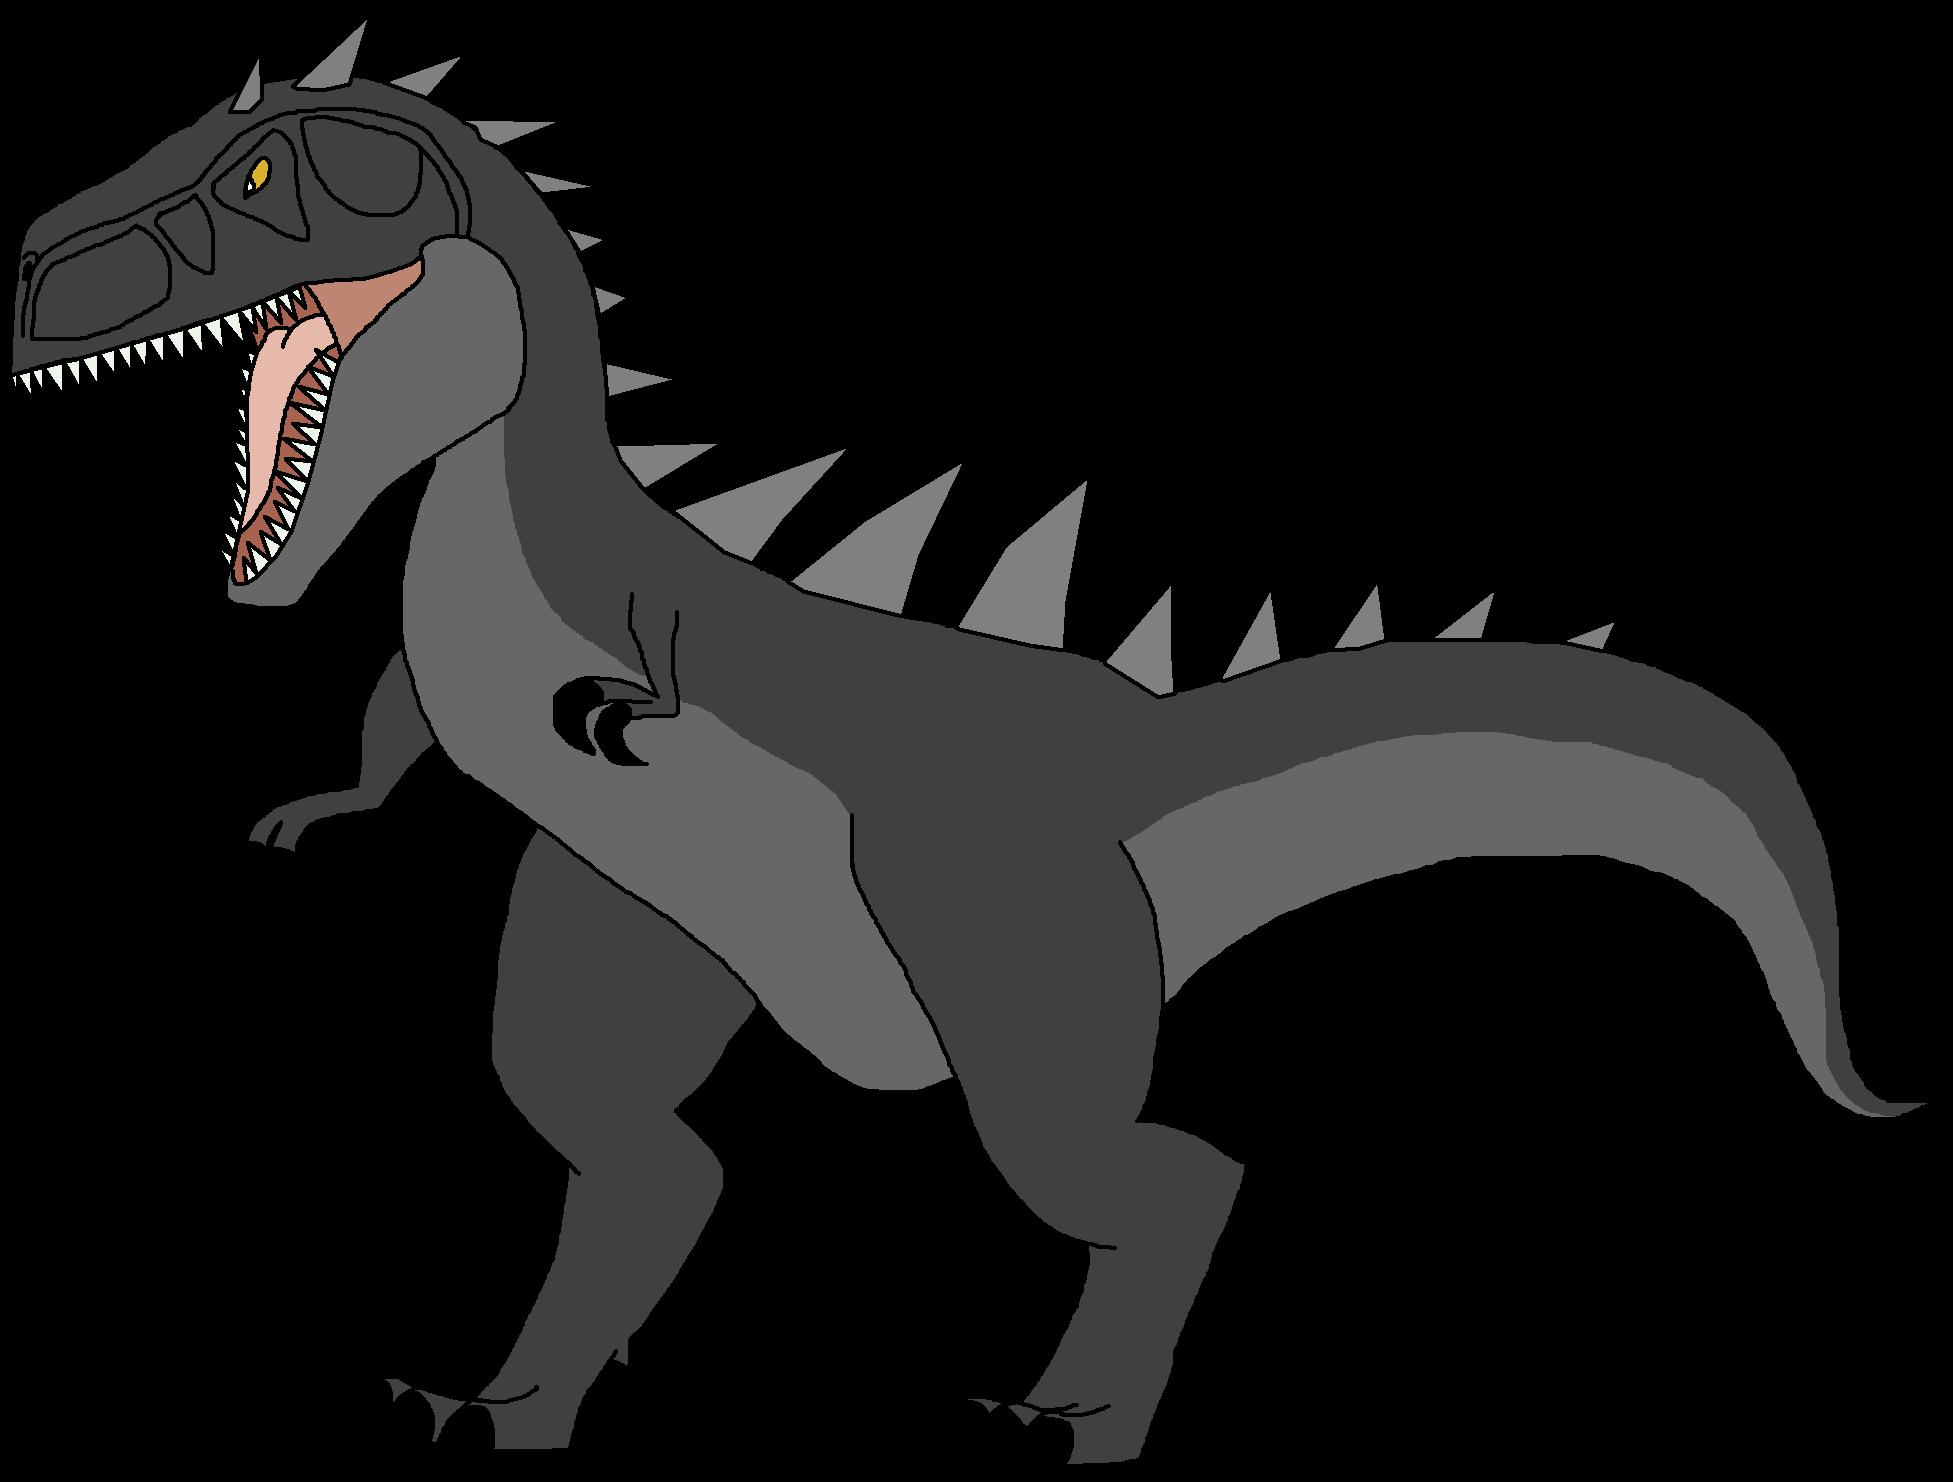 Tyrannotitan pedia wikia fandom. Dinosaurs clipart carnivore dinosaur